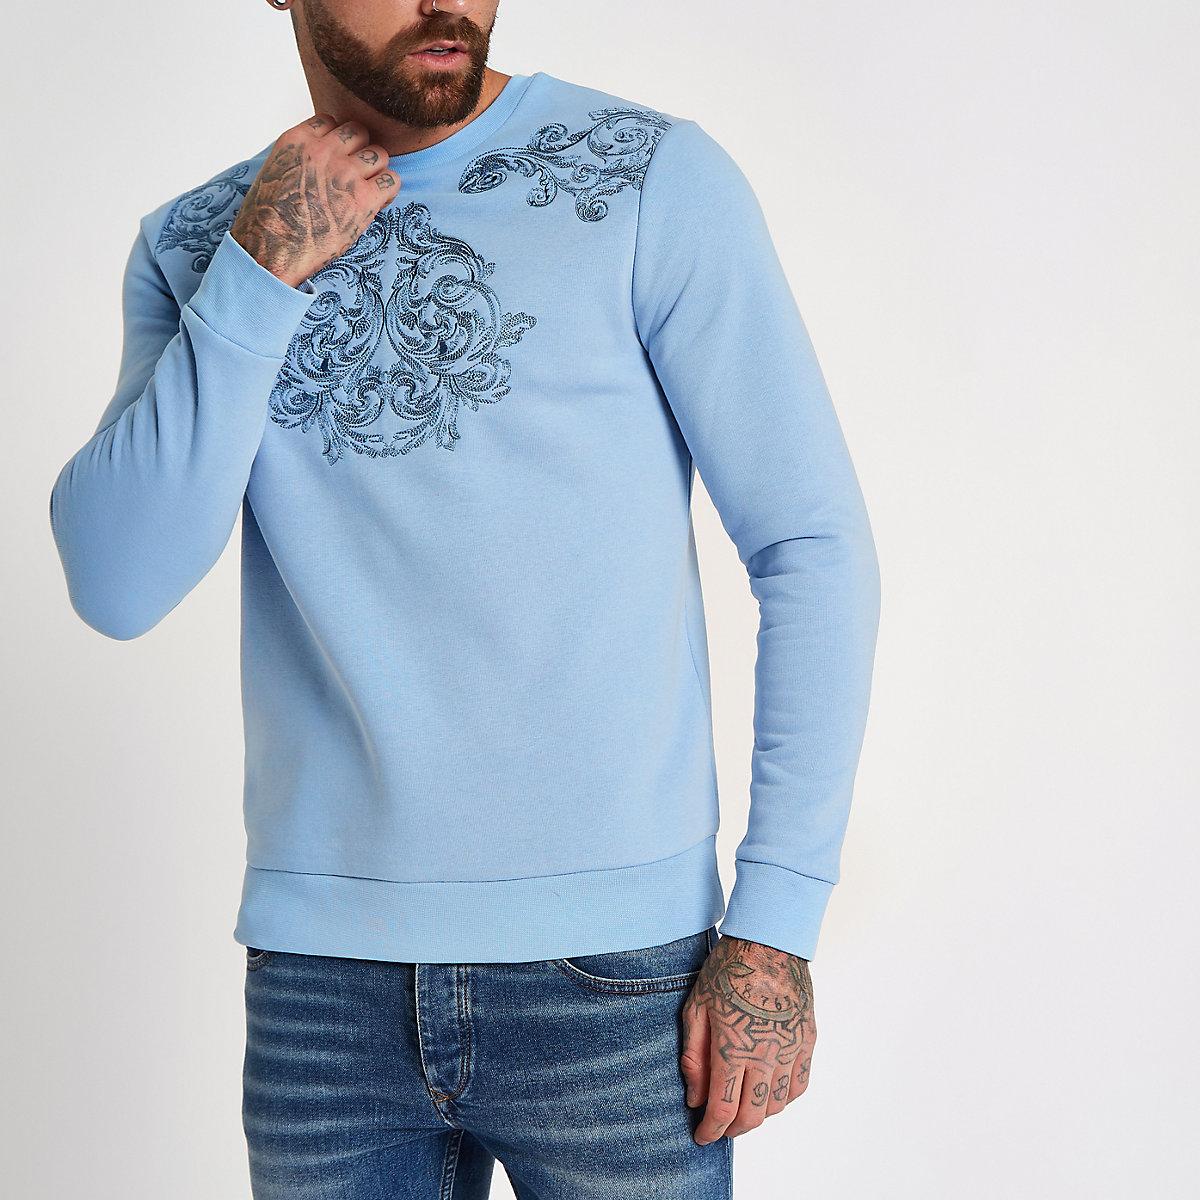 Light blue embroidered sweatshirt